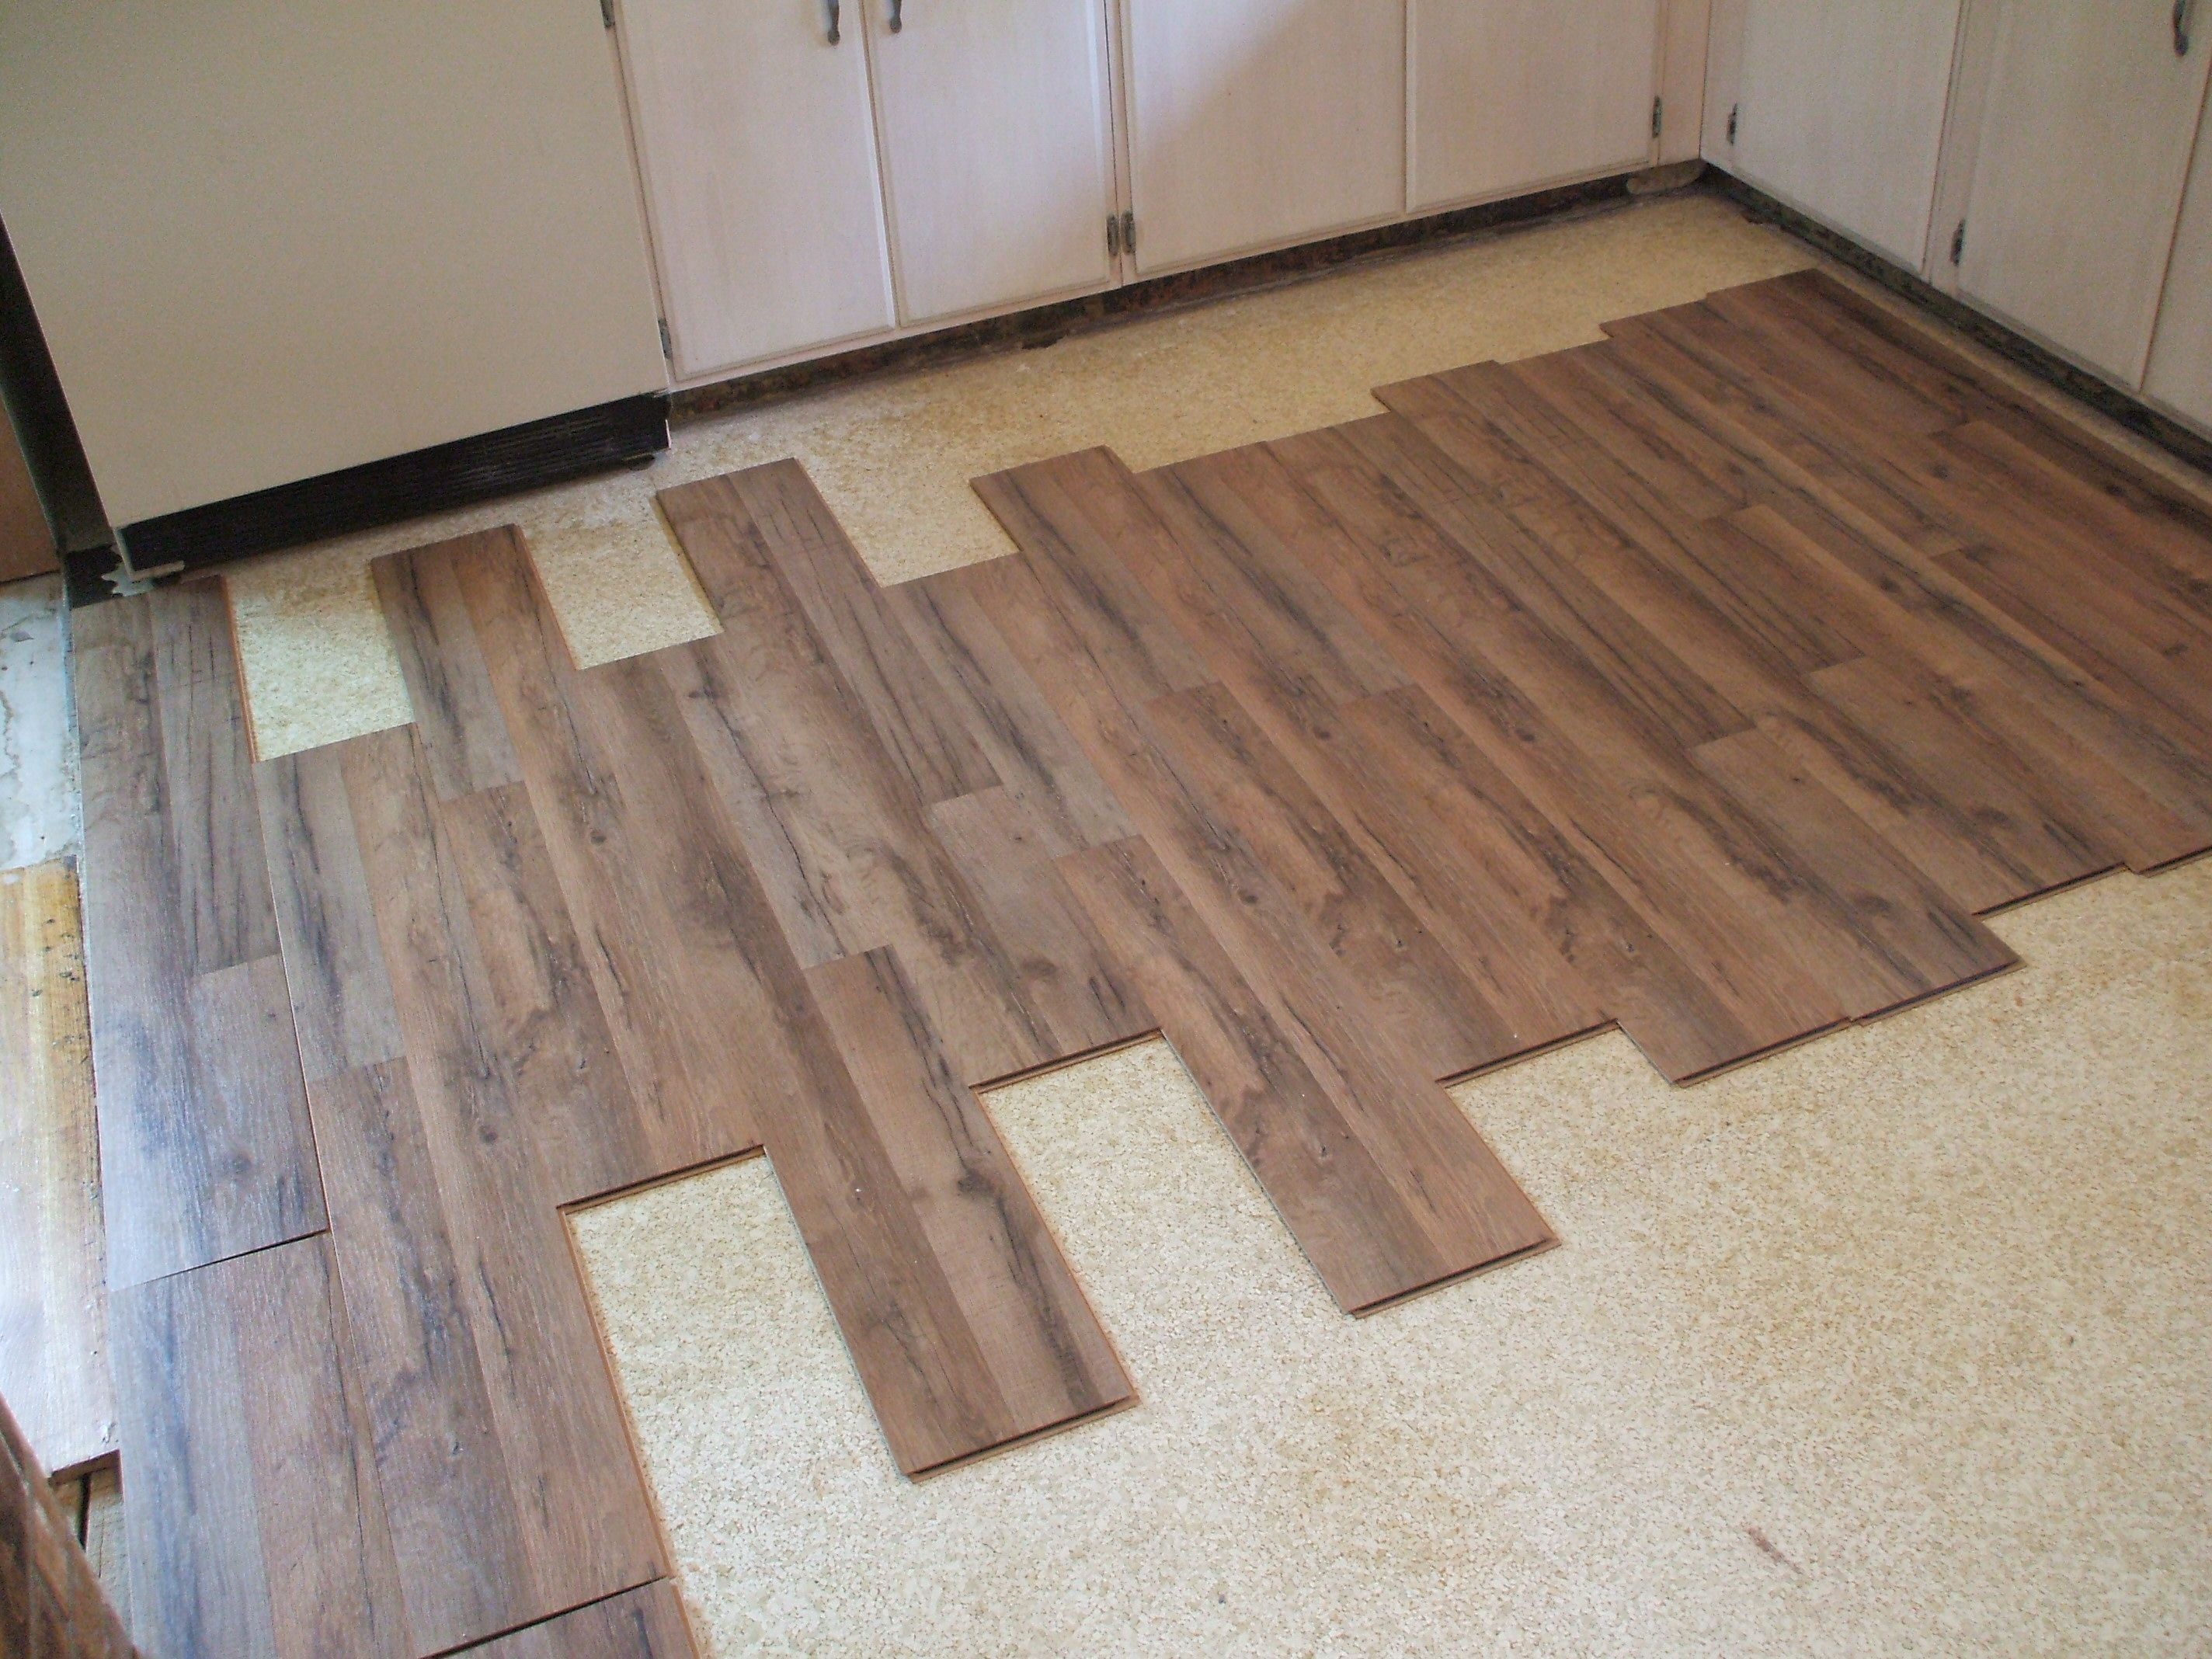 Laying Laminate Flooring Around A Toilet Installing Laminate Wood Flooring Vinyl Plank Flooring Installing Laminate Flooring